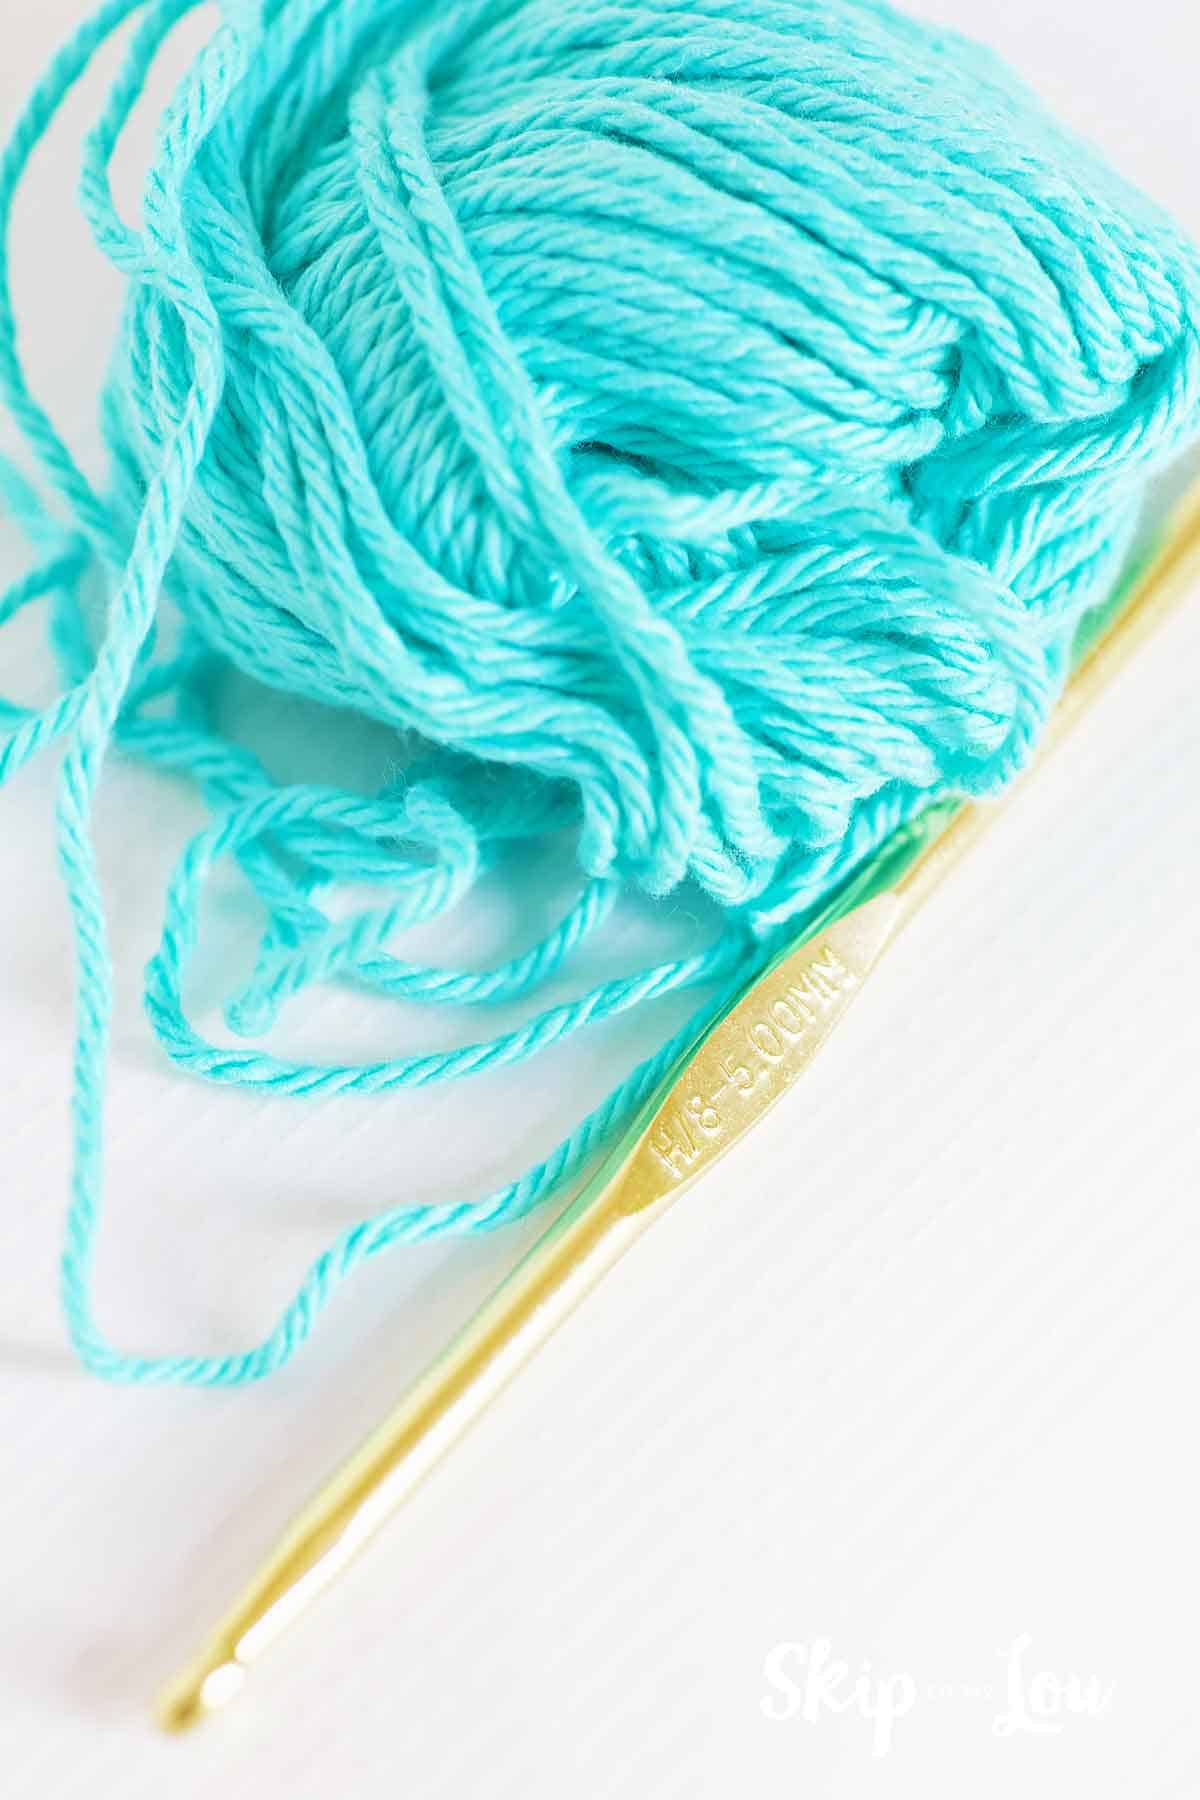 cotton yarn next to H crochet hook